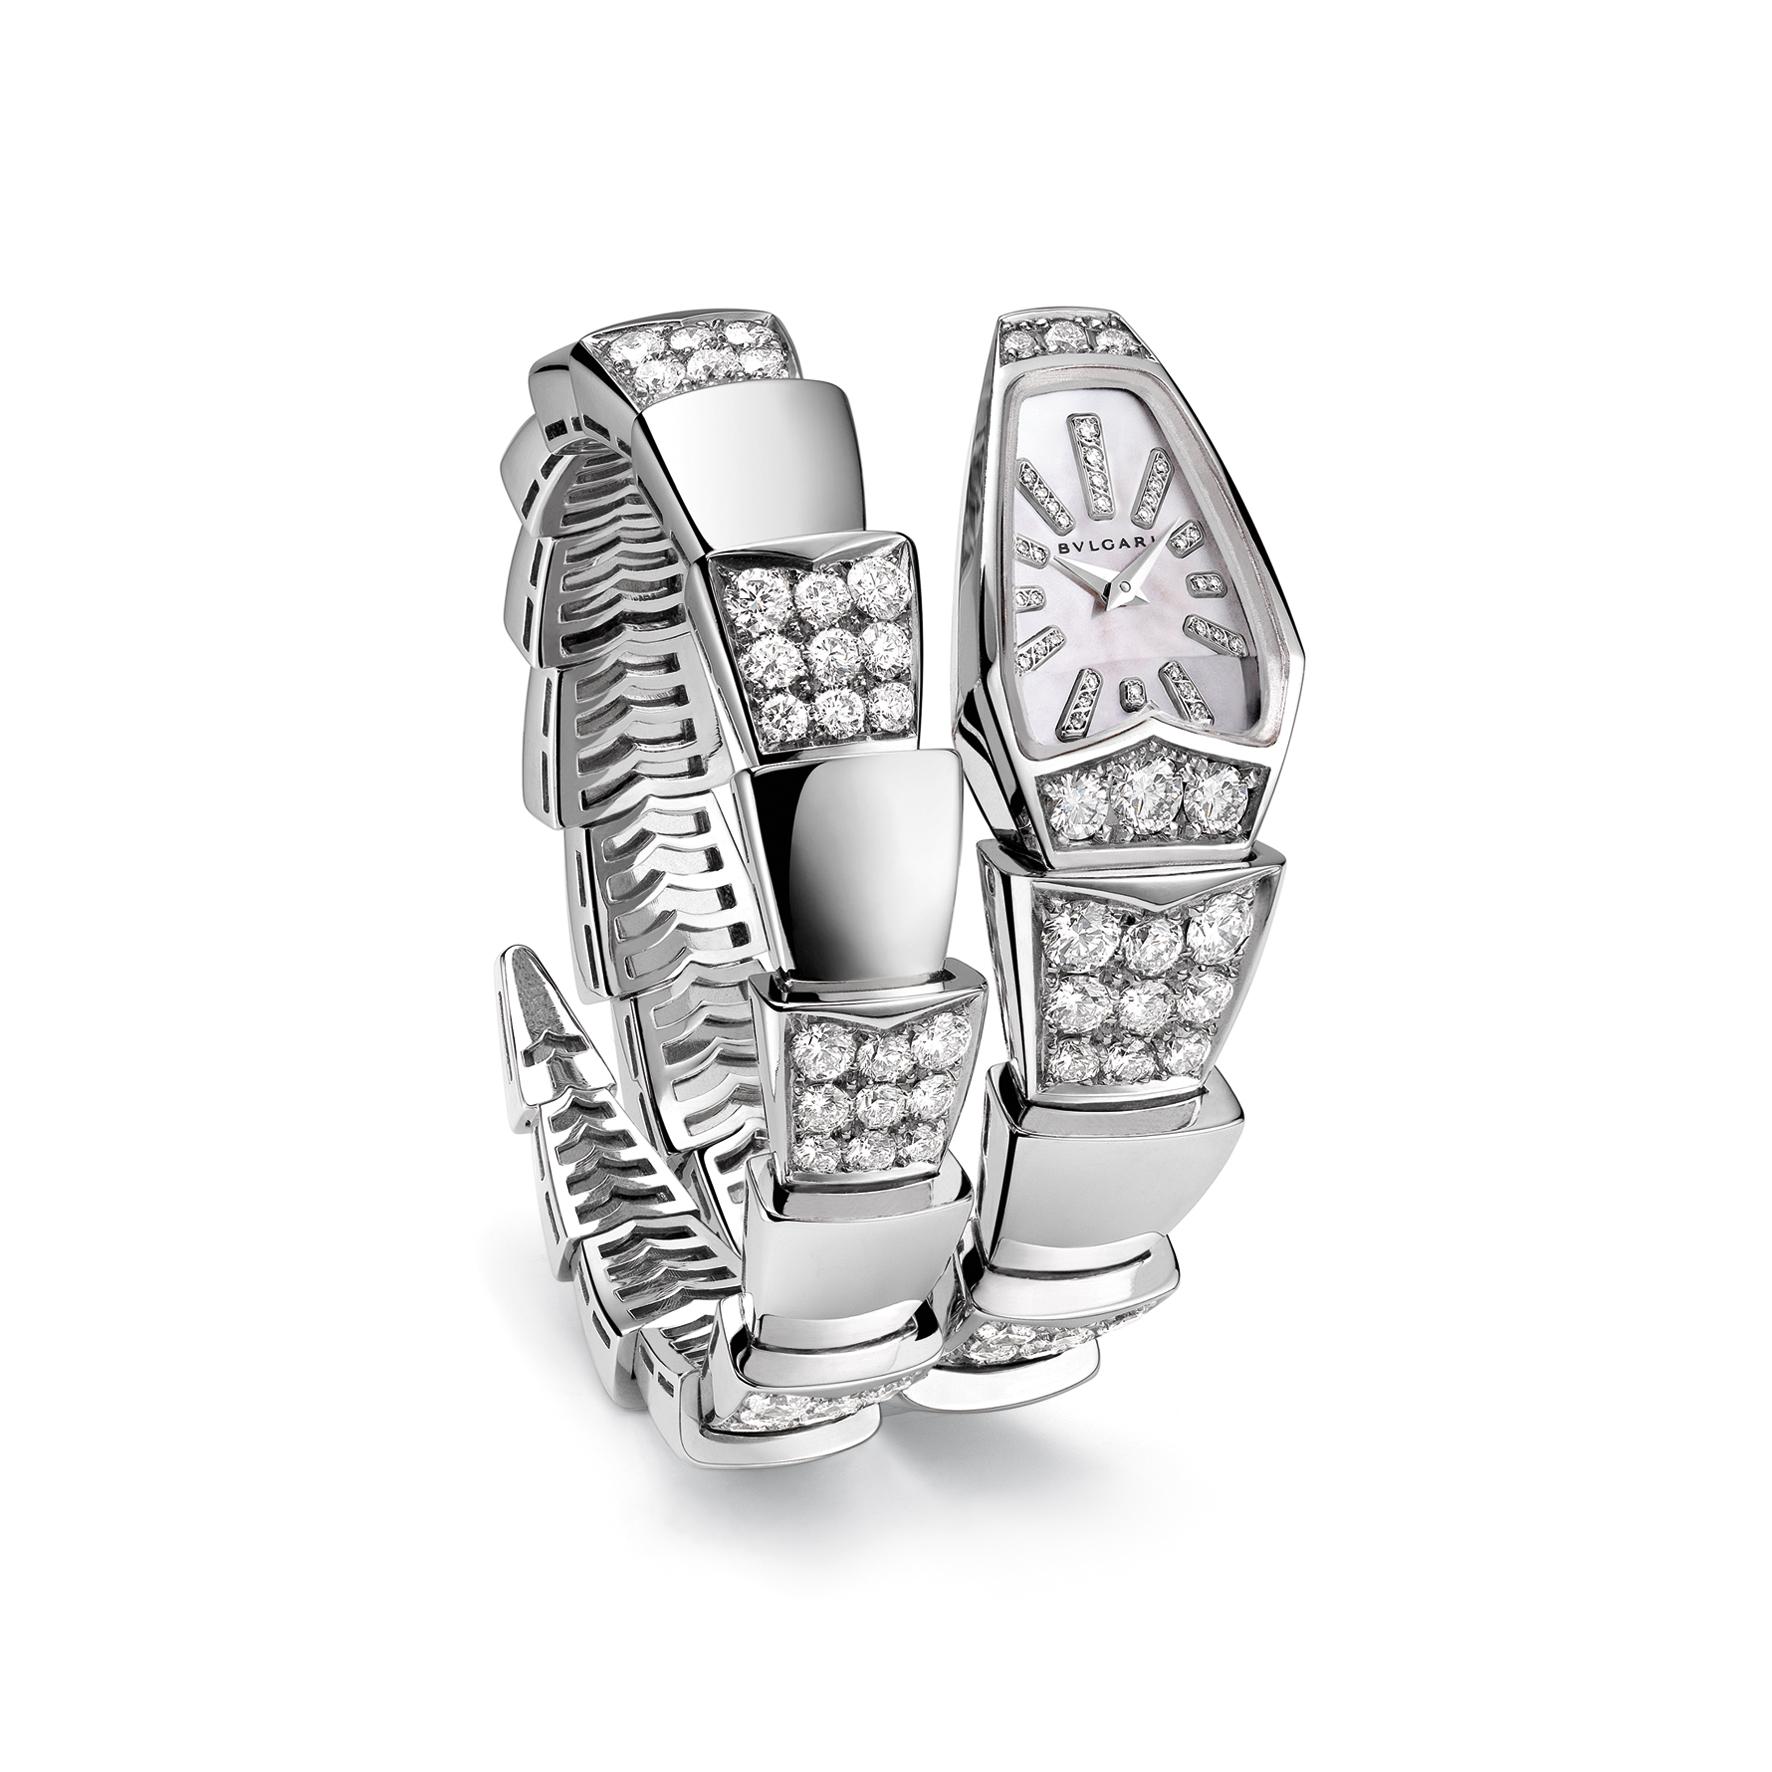 101787- Serpenti watch, 26mm, white gold-diamonds-case, White mother of pearl-diamonds dial, Quartz movement, Diamonds 134 pce, Weight diamonds 8.0 [ct], Weight precious metal 70.5